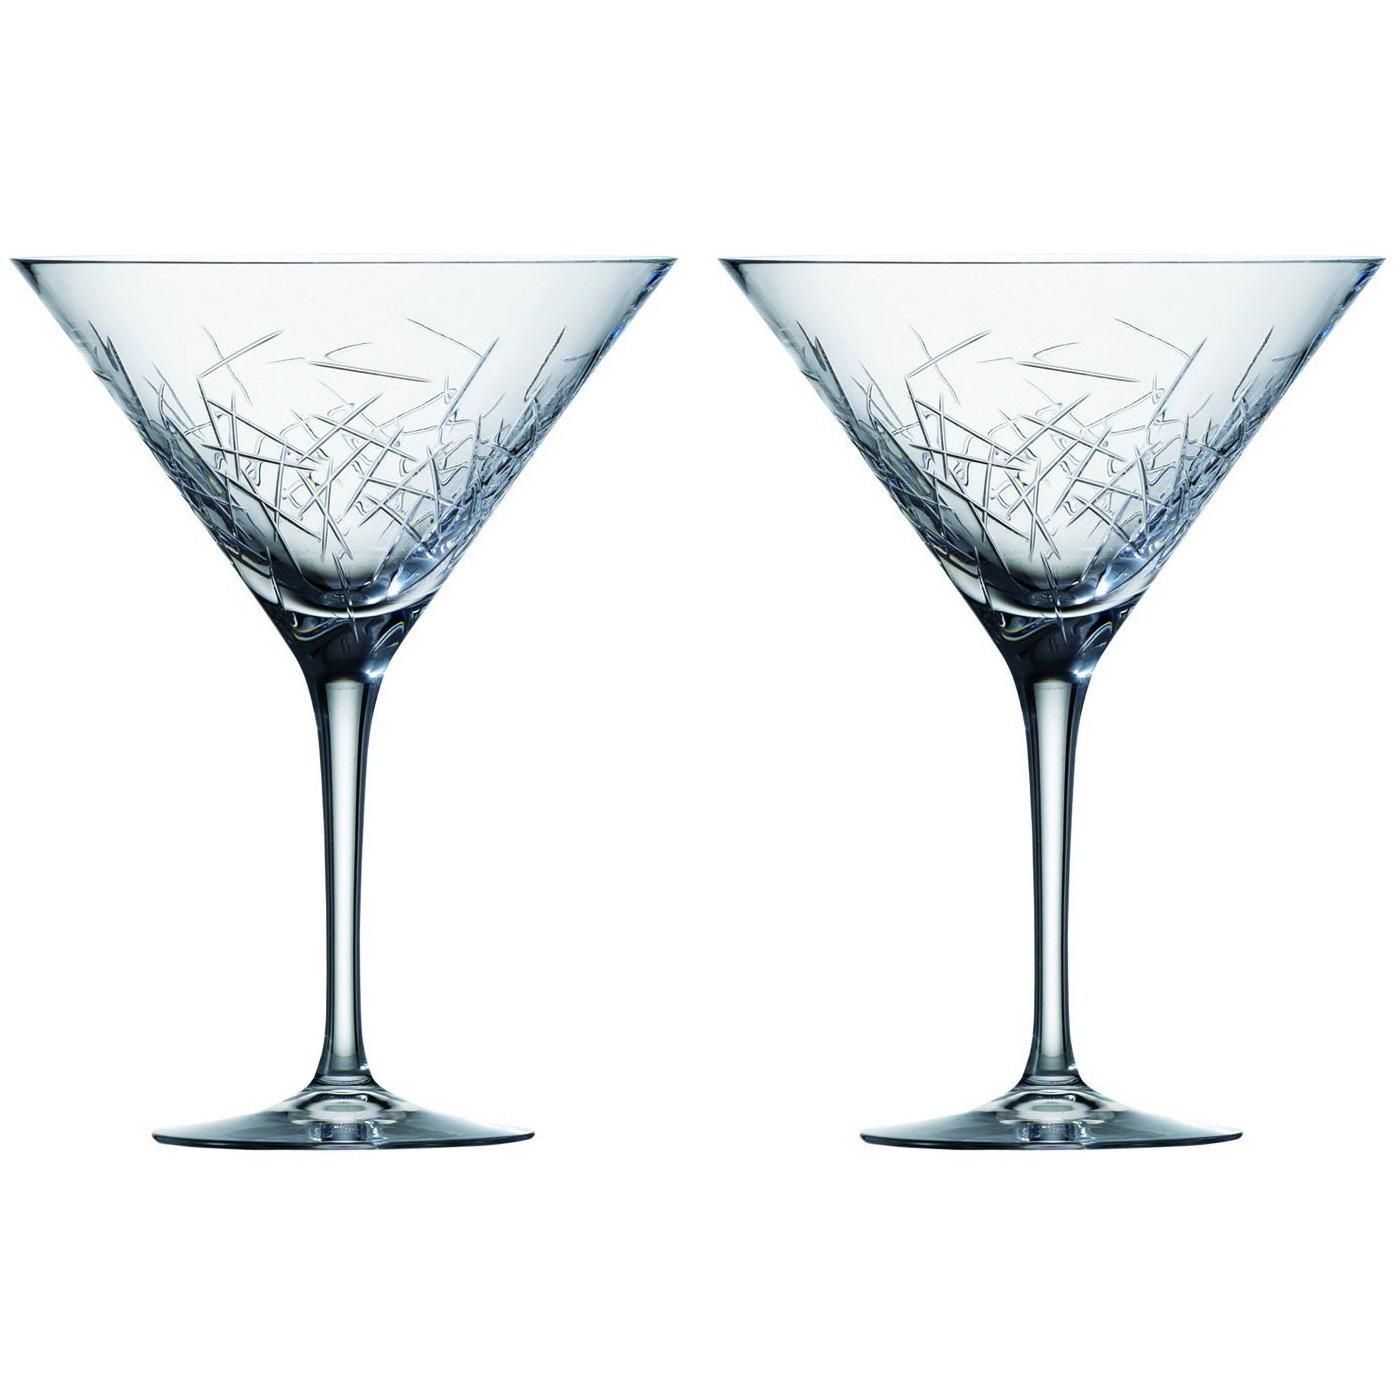 Набор фужеров для мартини «Hommage Glace», 295 мл, цены онлайн